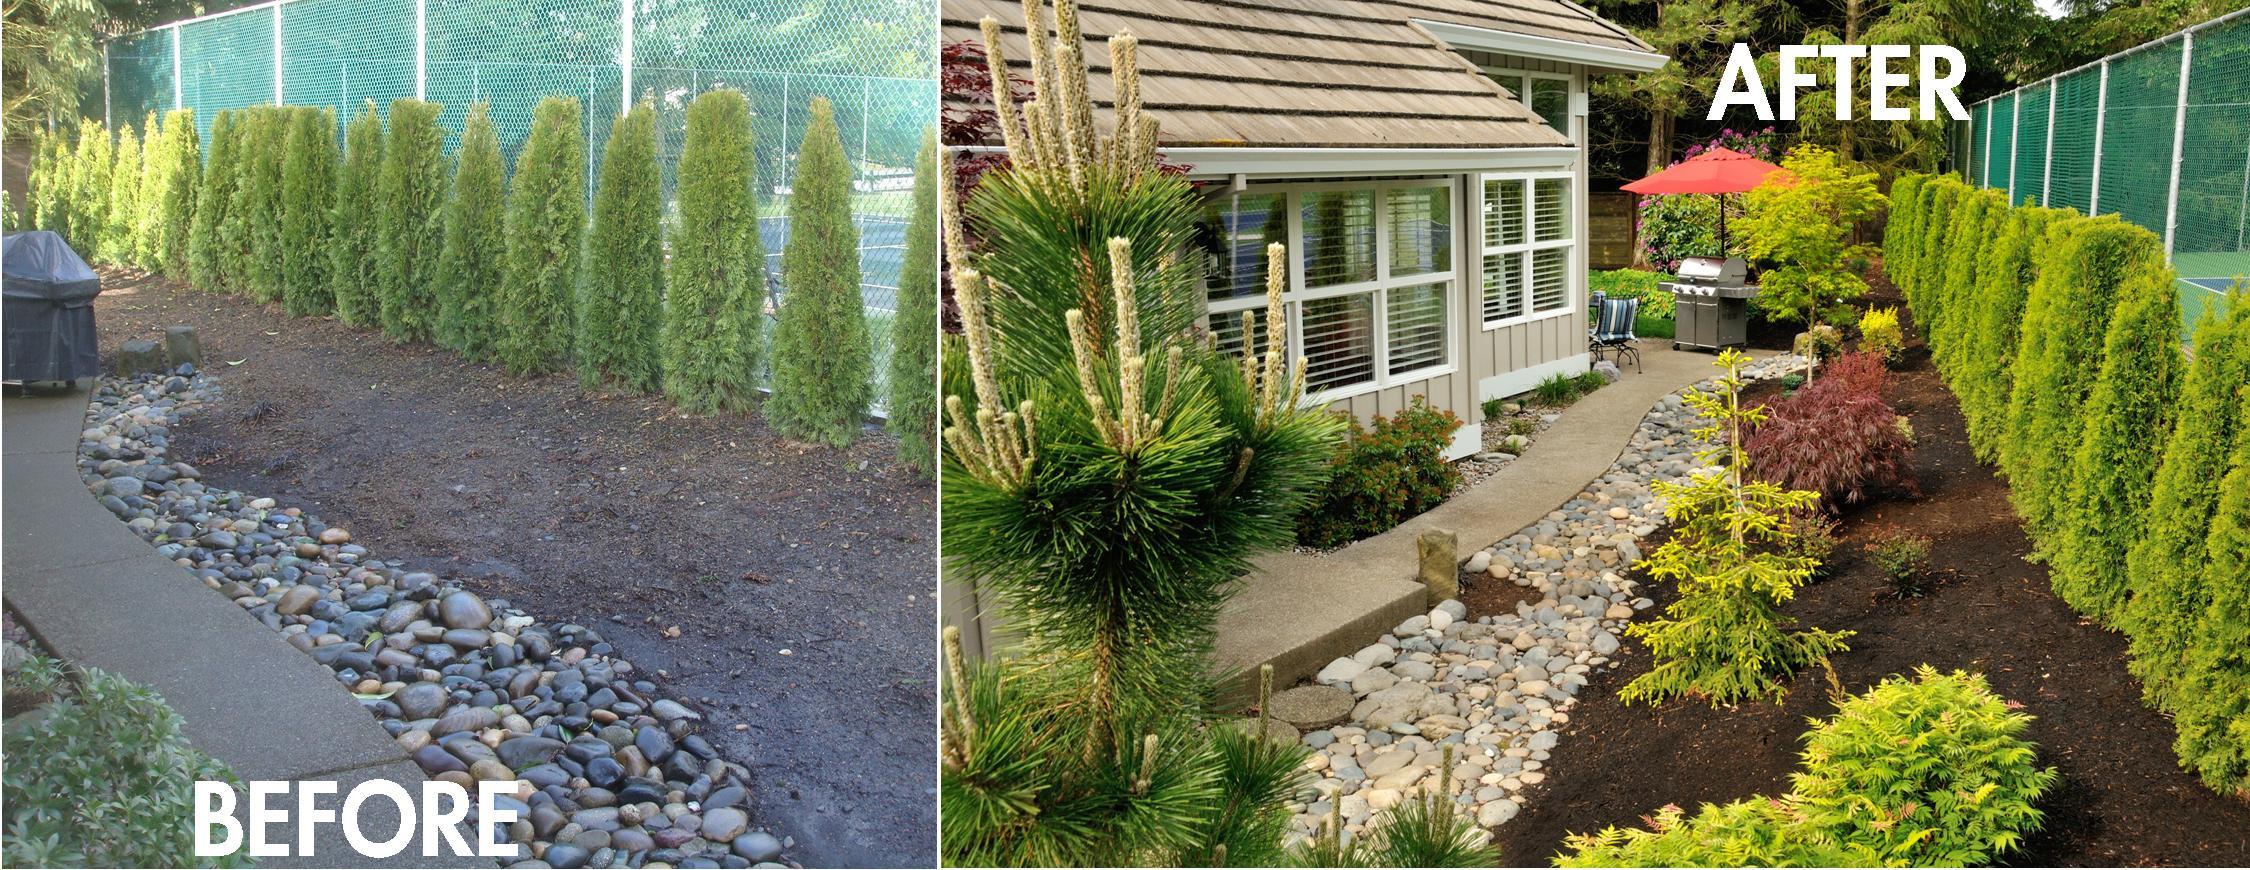 Best ideas about DIY Landscape Design . Save or Pin landscape design Now.